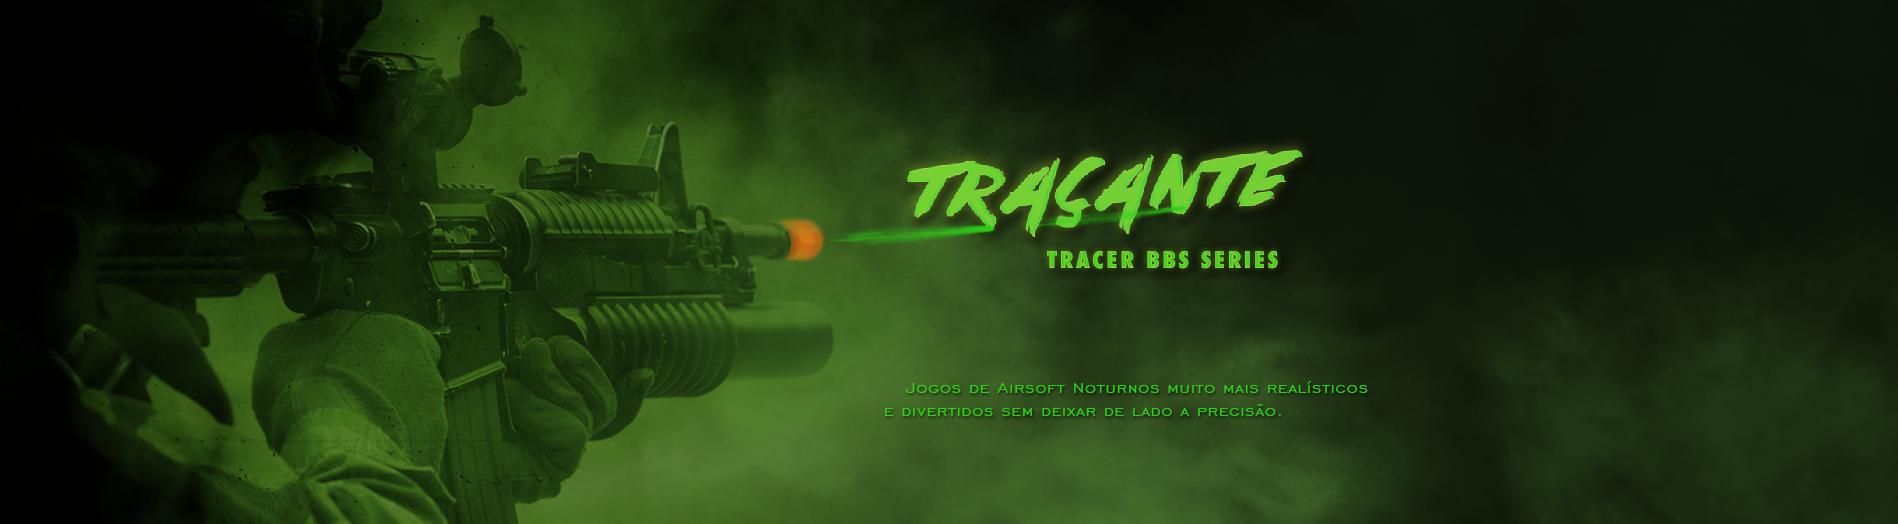 banner-bioattack-bio-attack-tracante-bb-bbs-airsoft